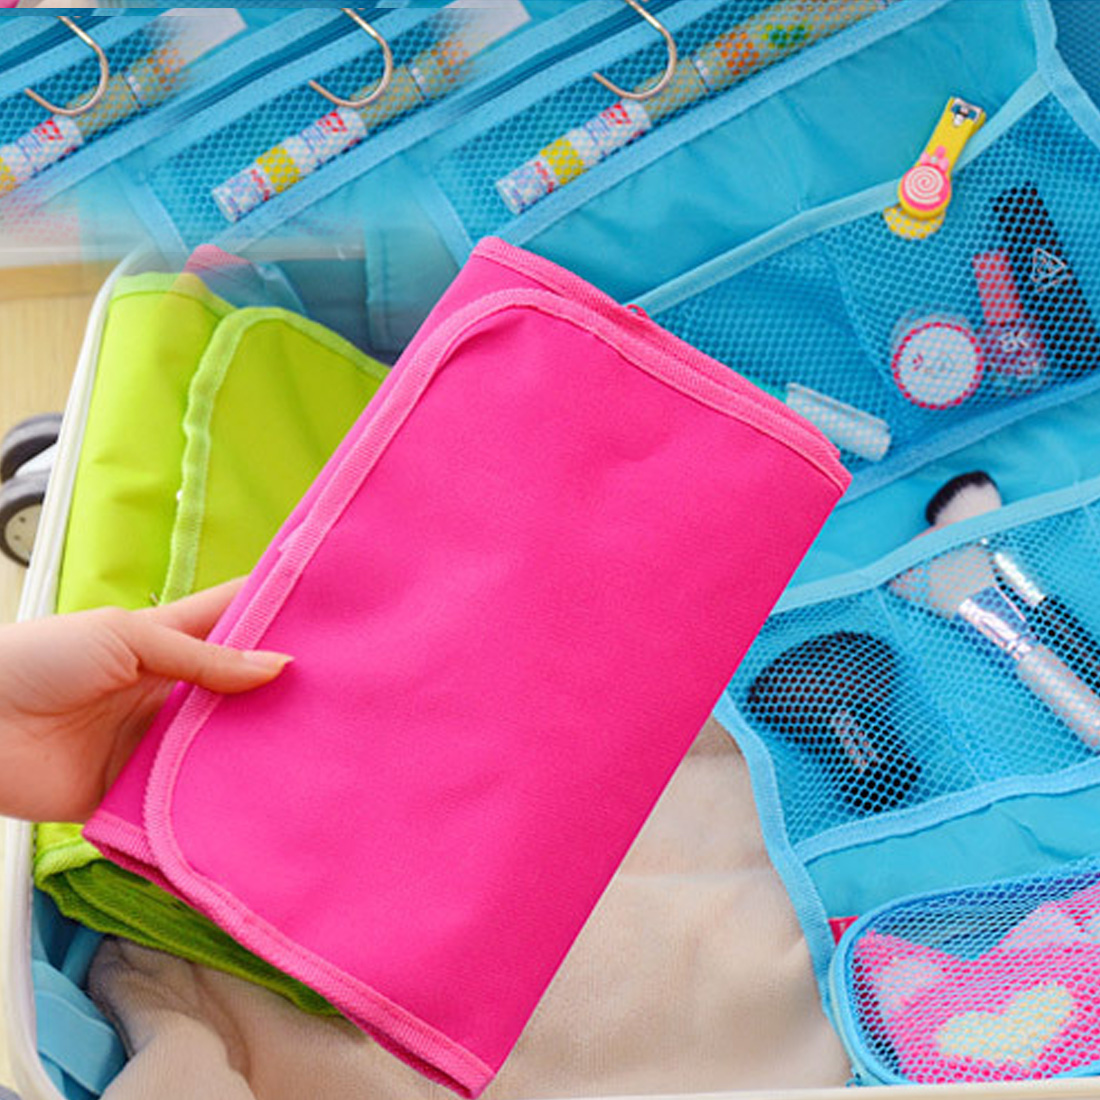 Portable Hanging Organizer Bag Foldable Cosmetic Makeup Case